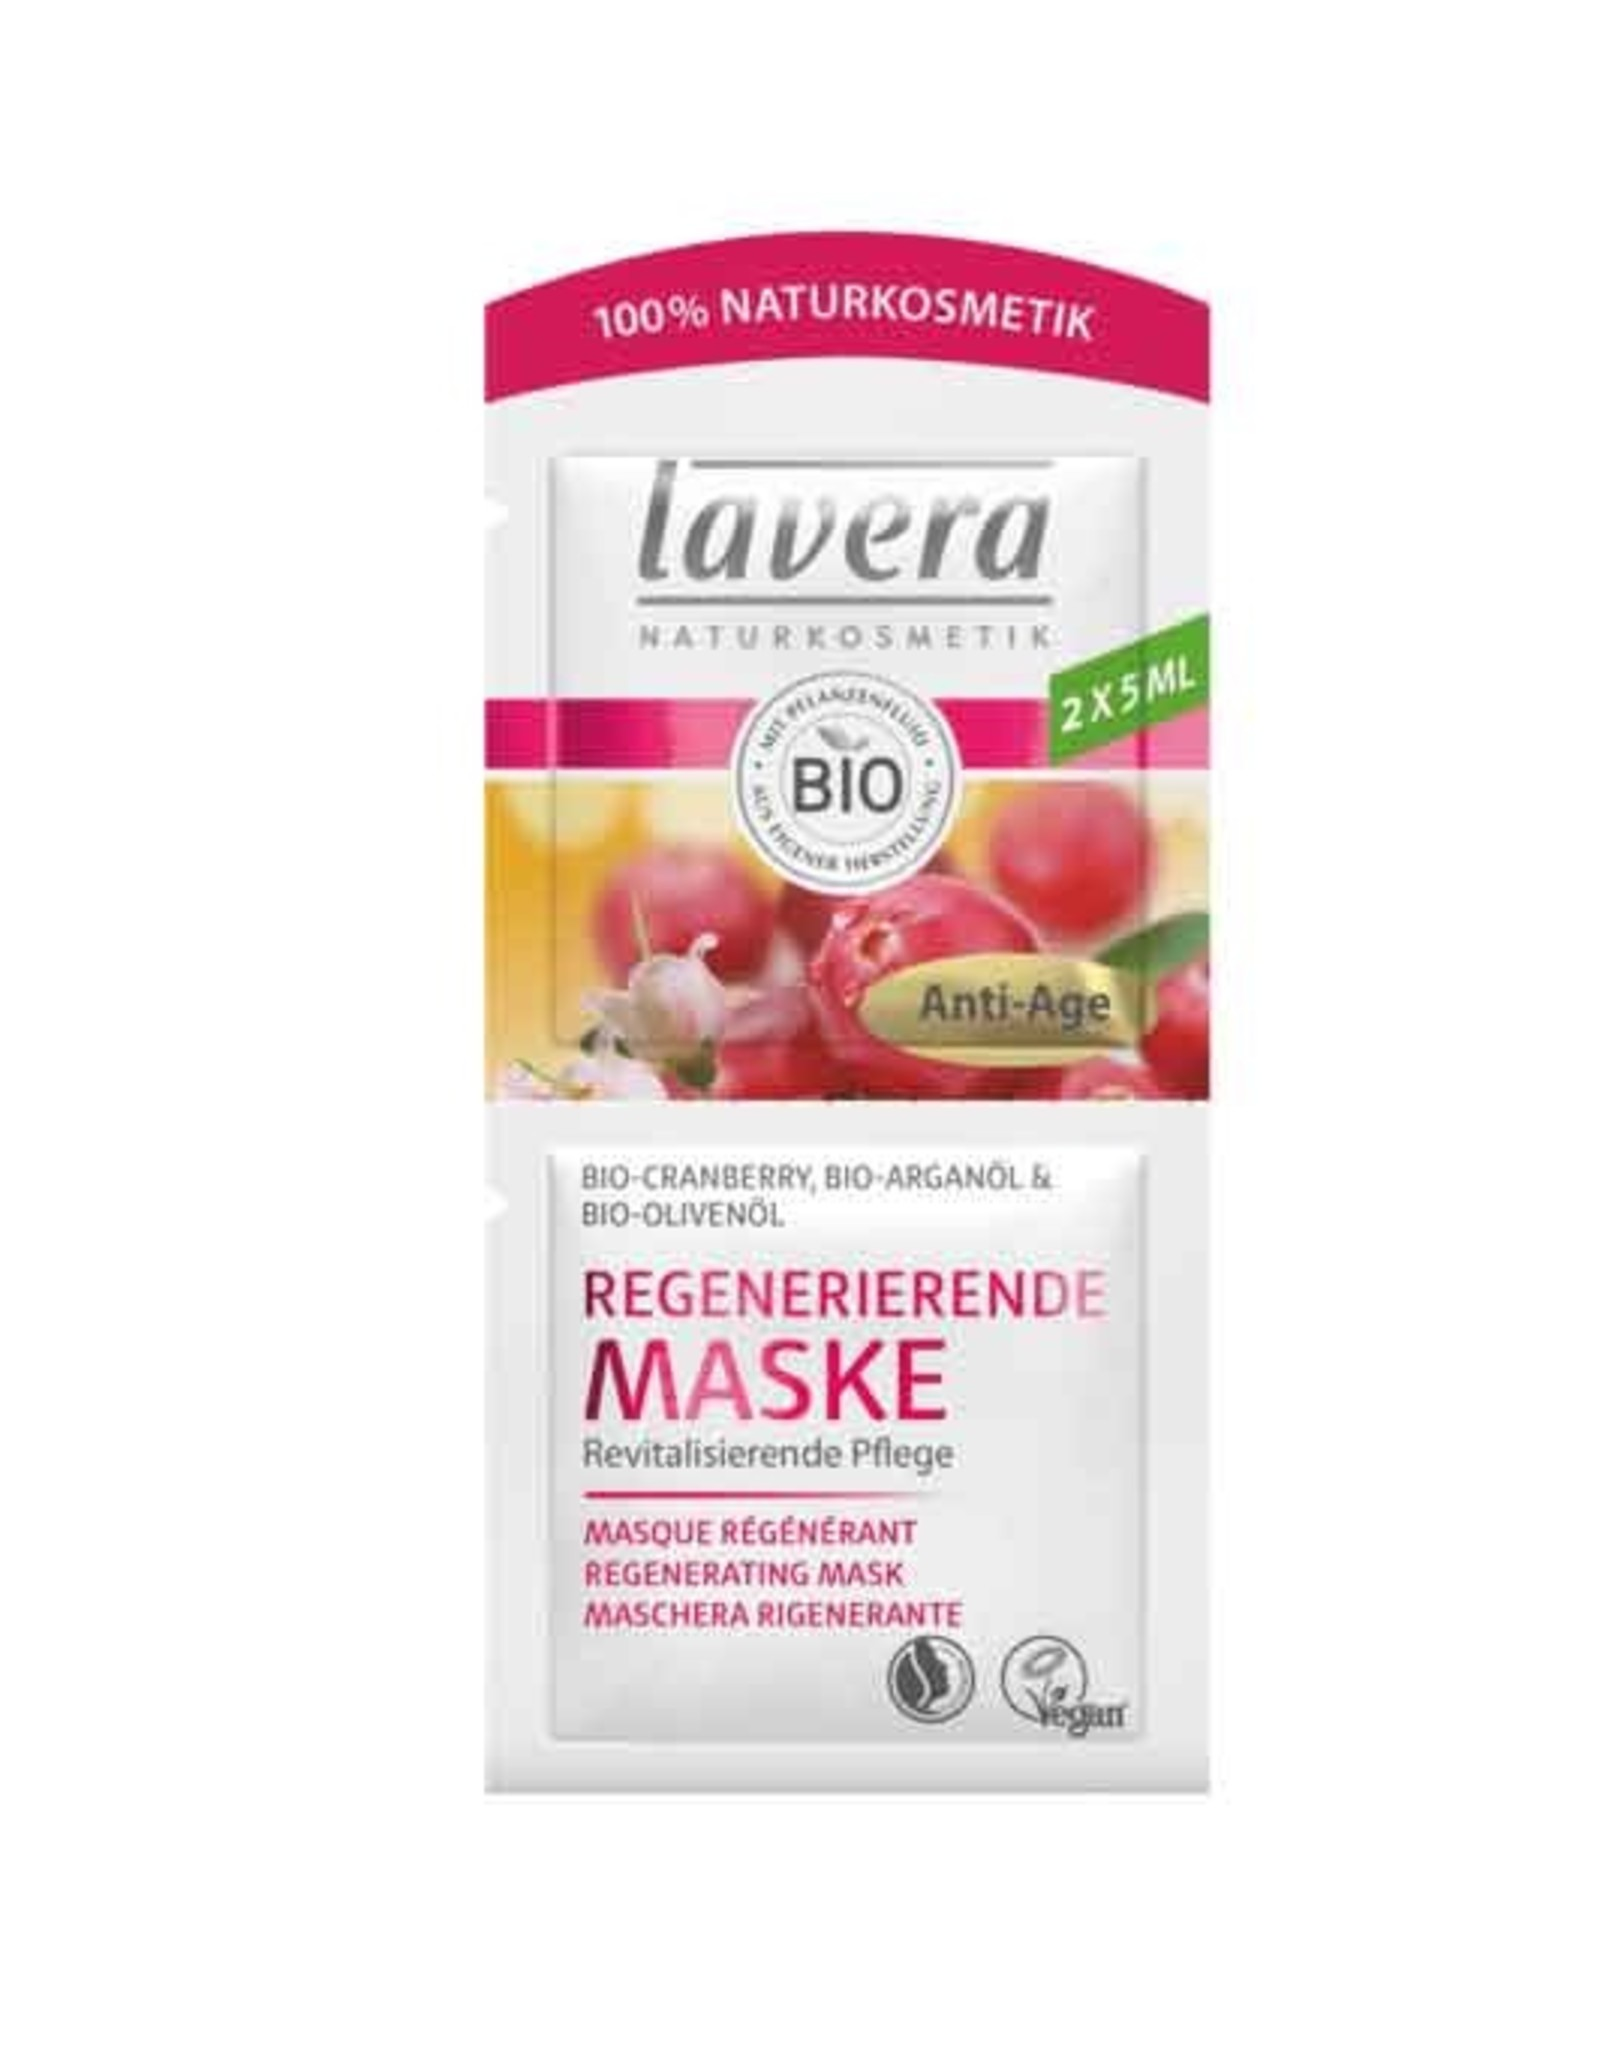 Lavera Gezichtsmasker Regenerating Mask 2x 5ml